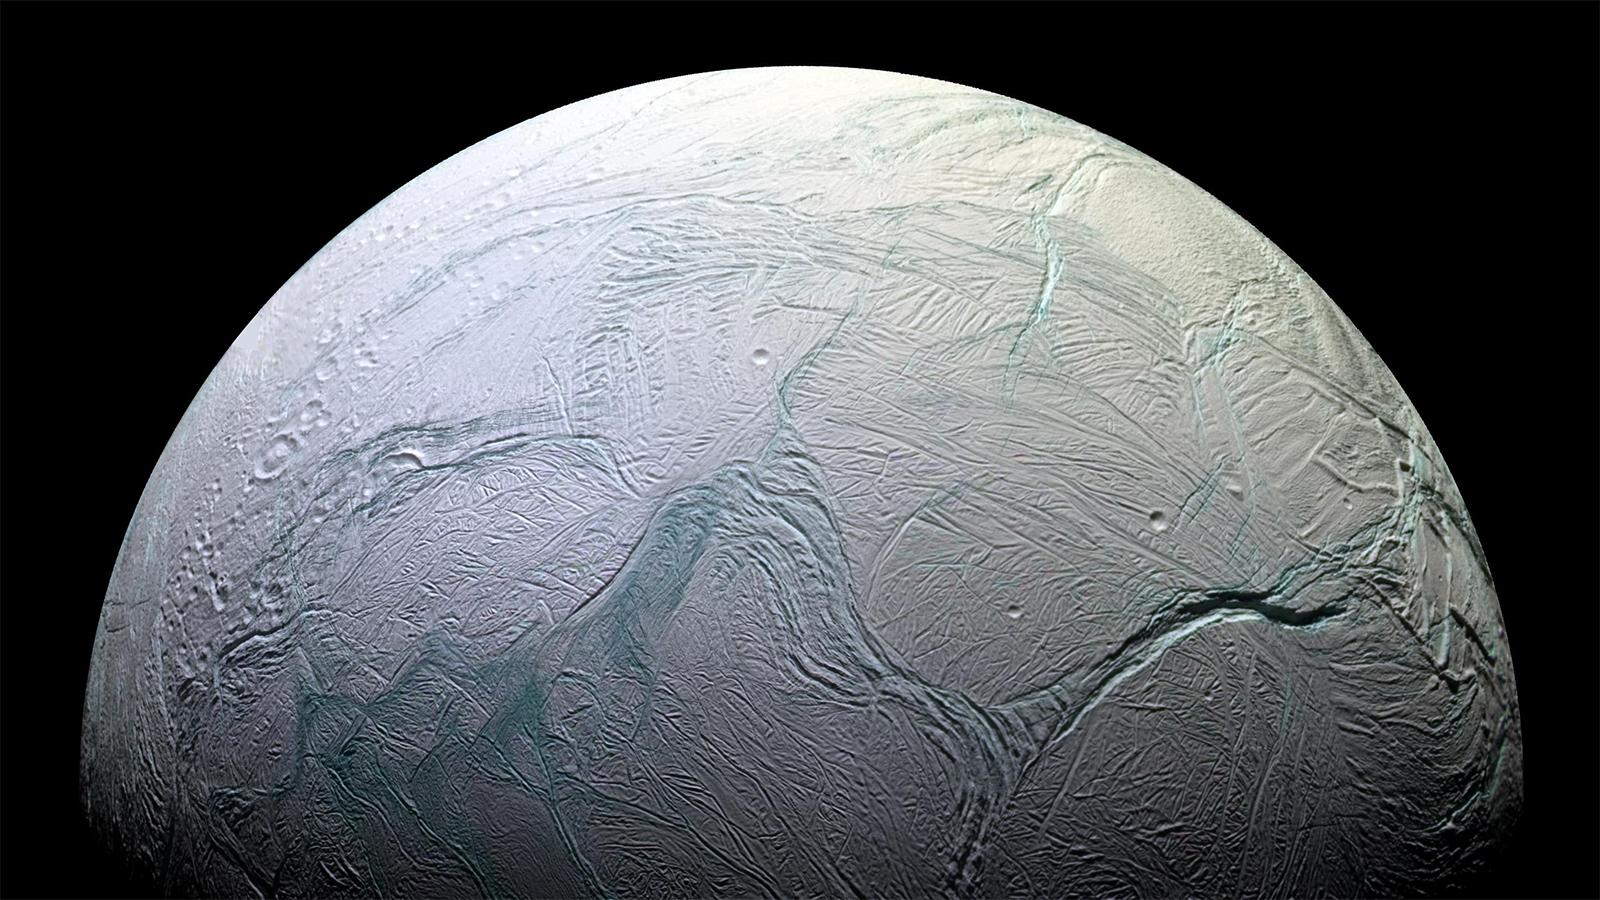 Enceladus. Bild: NASA/JPL-Caltech